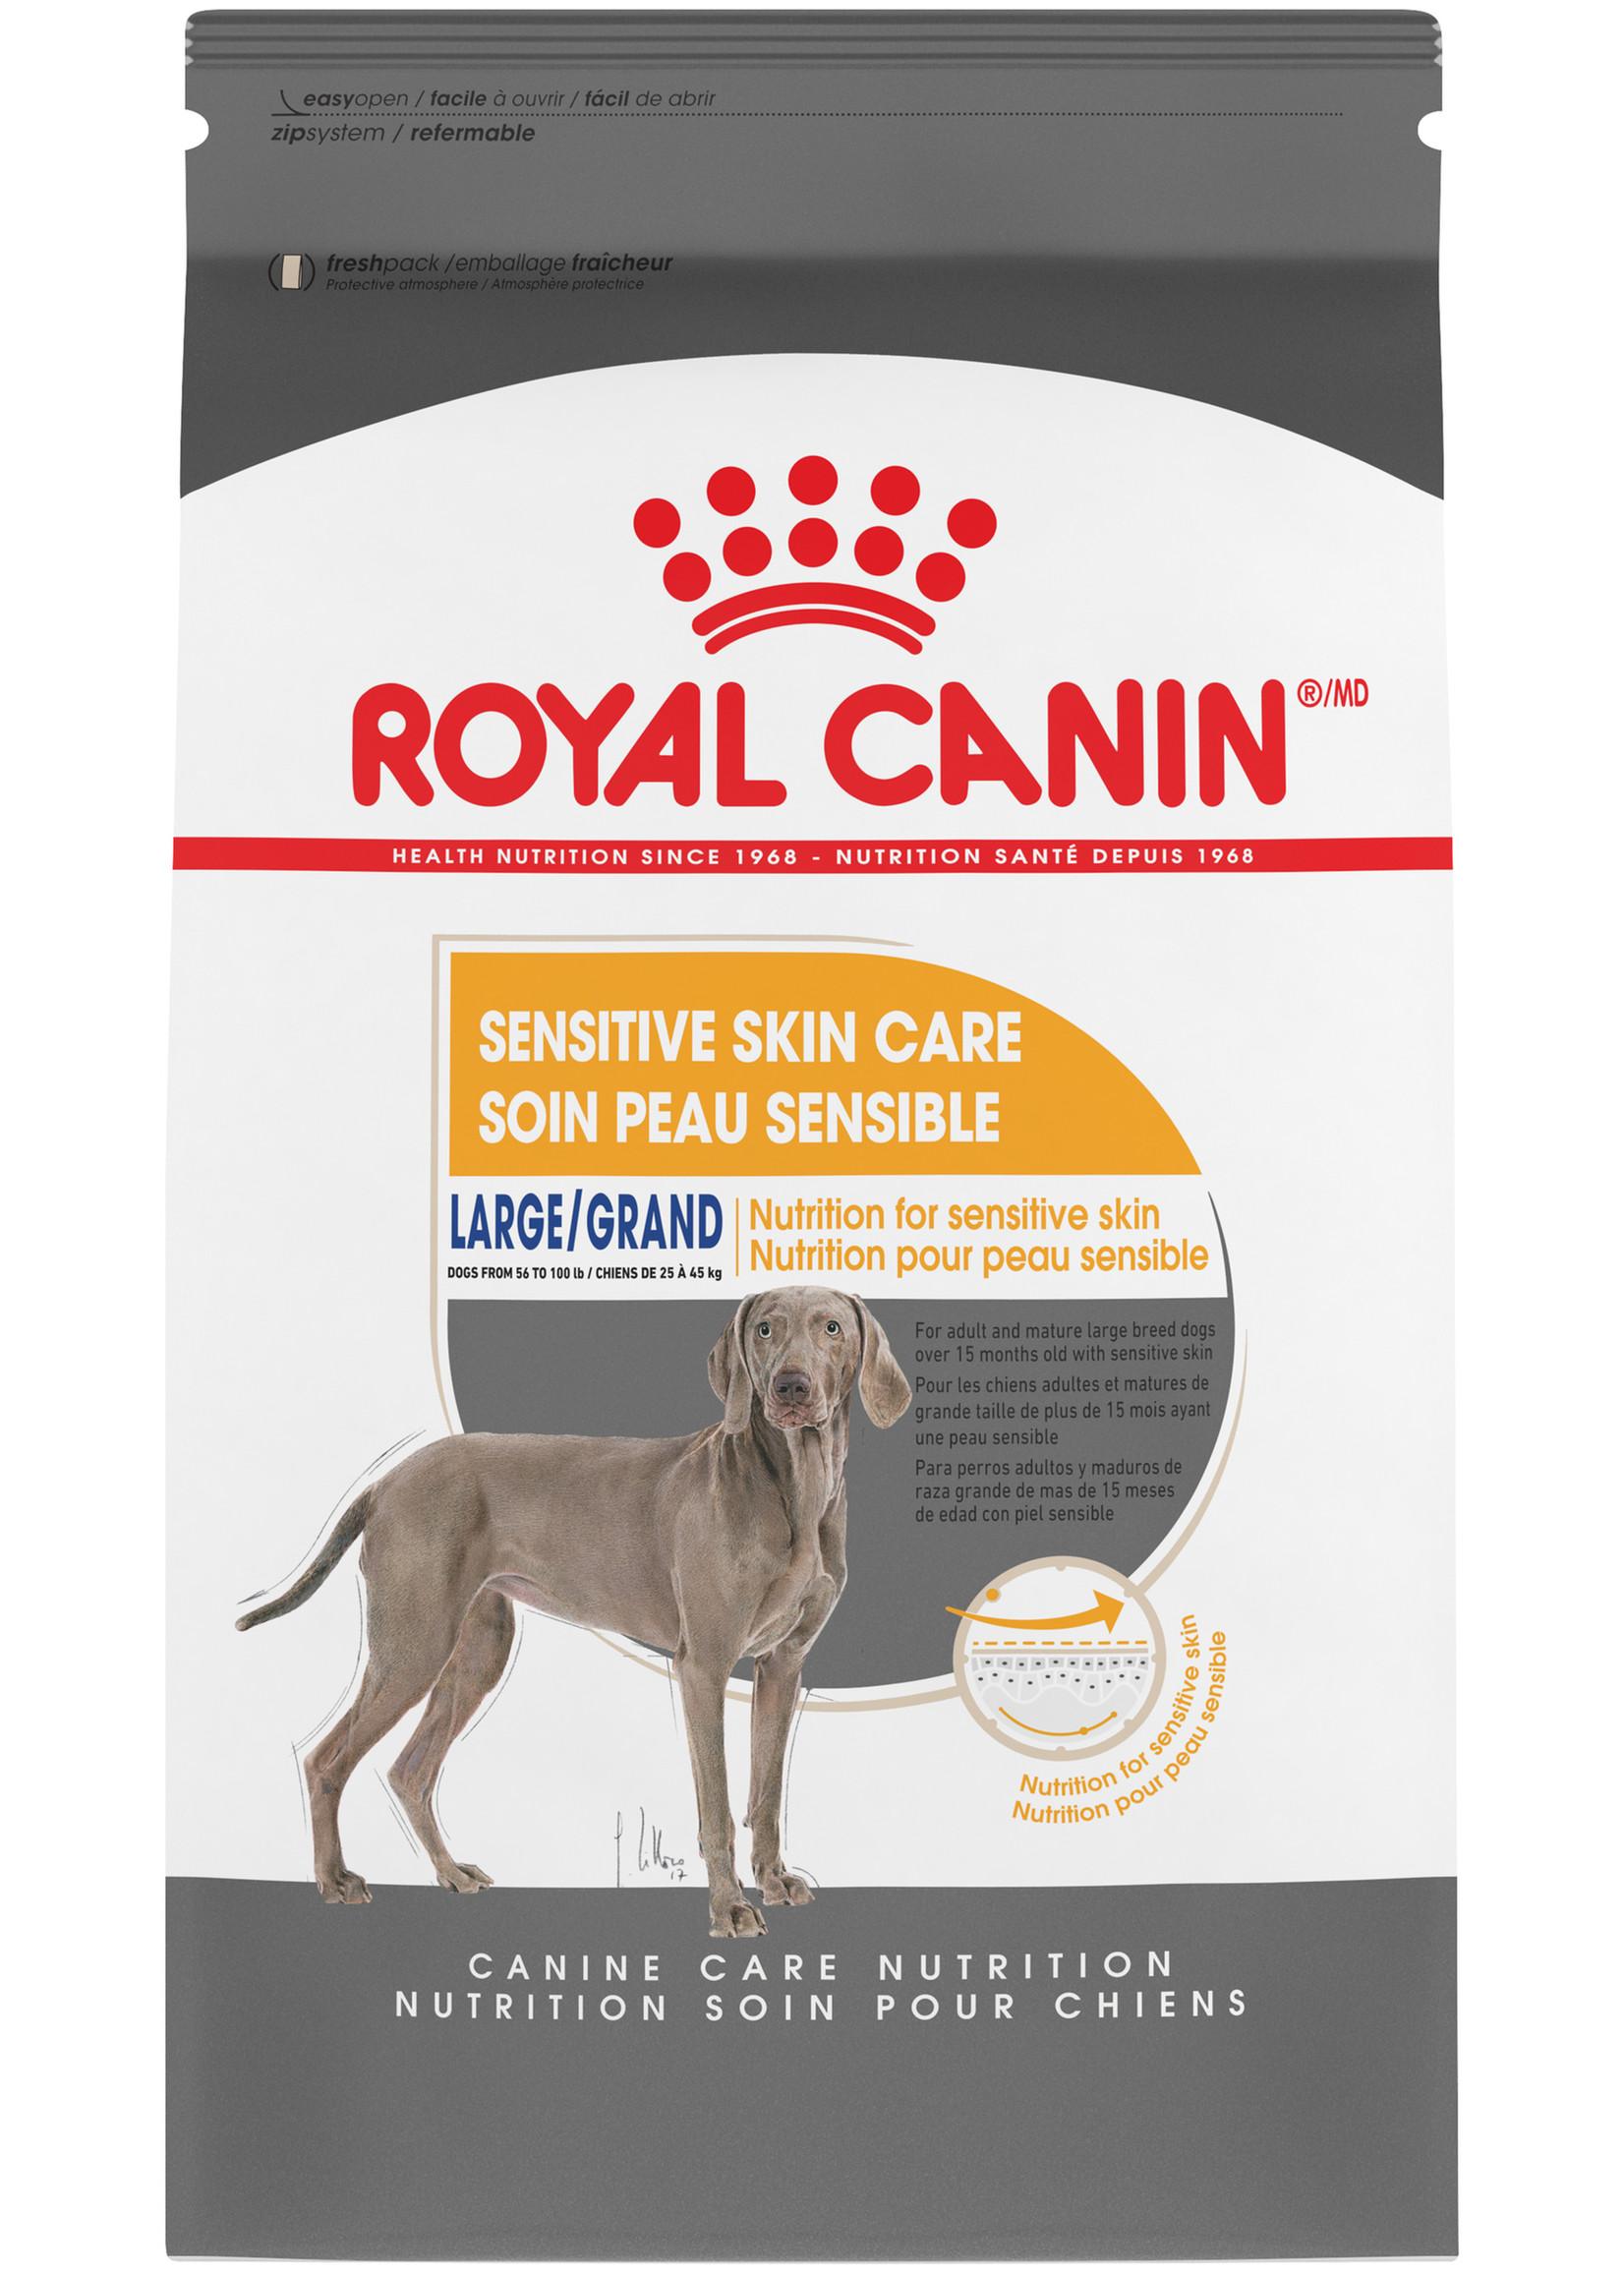 Royal Canin Royal Canin Dog Large Sensitive Skin Care 30lb